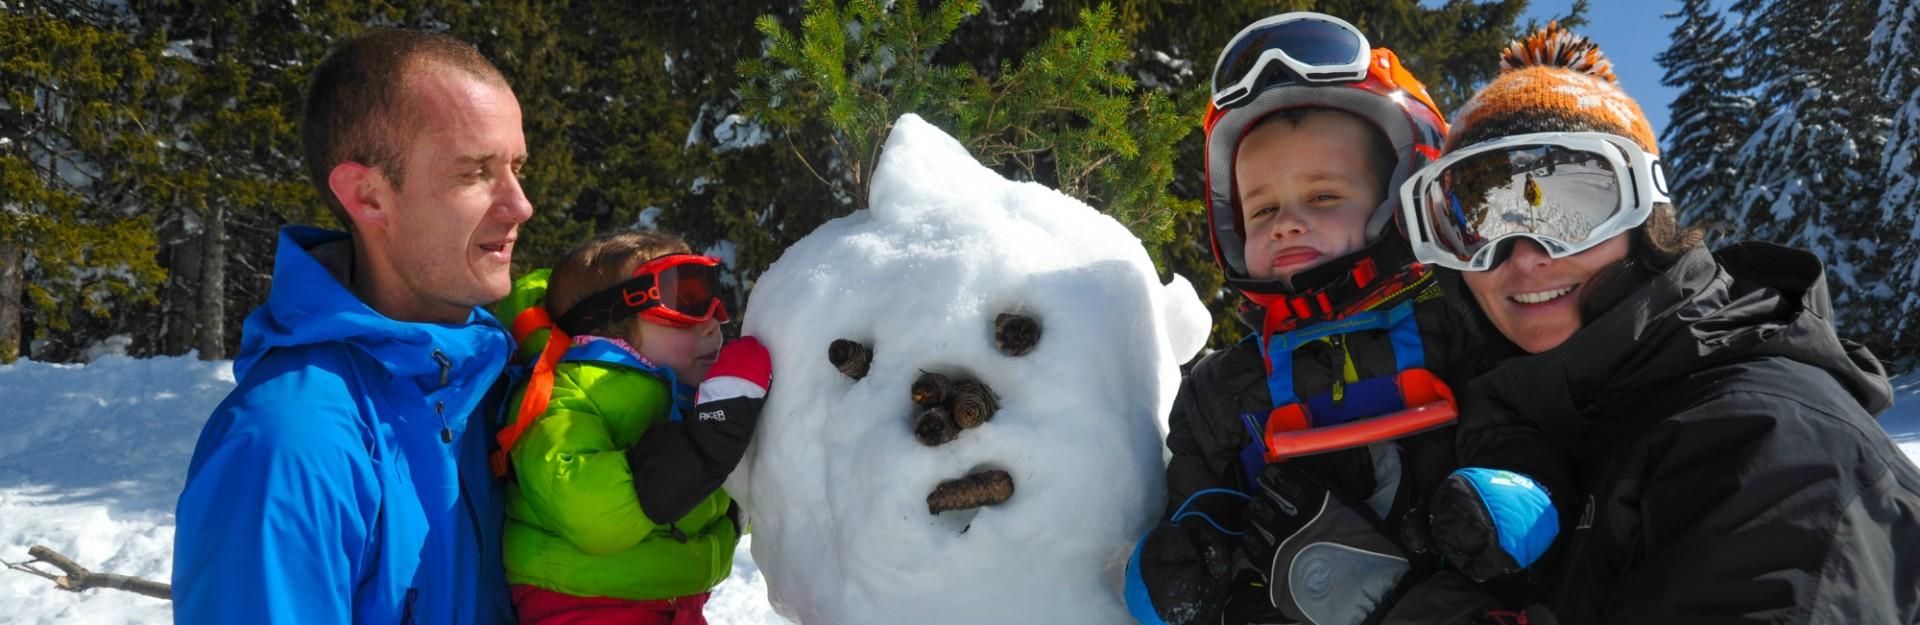 campsite l'oustalet | family skiing | winter | châtel | family ski resort | portes du soleil